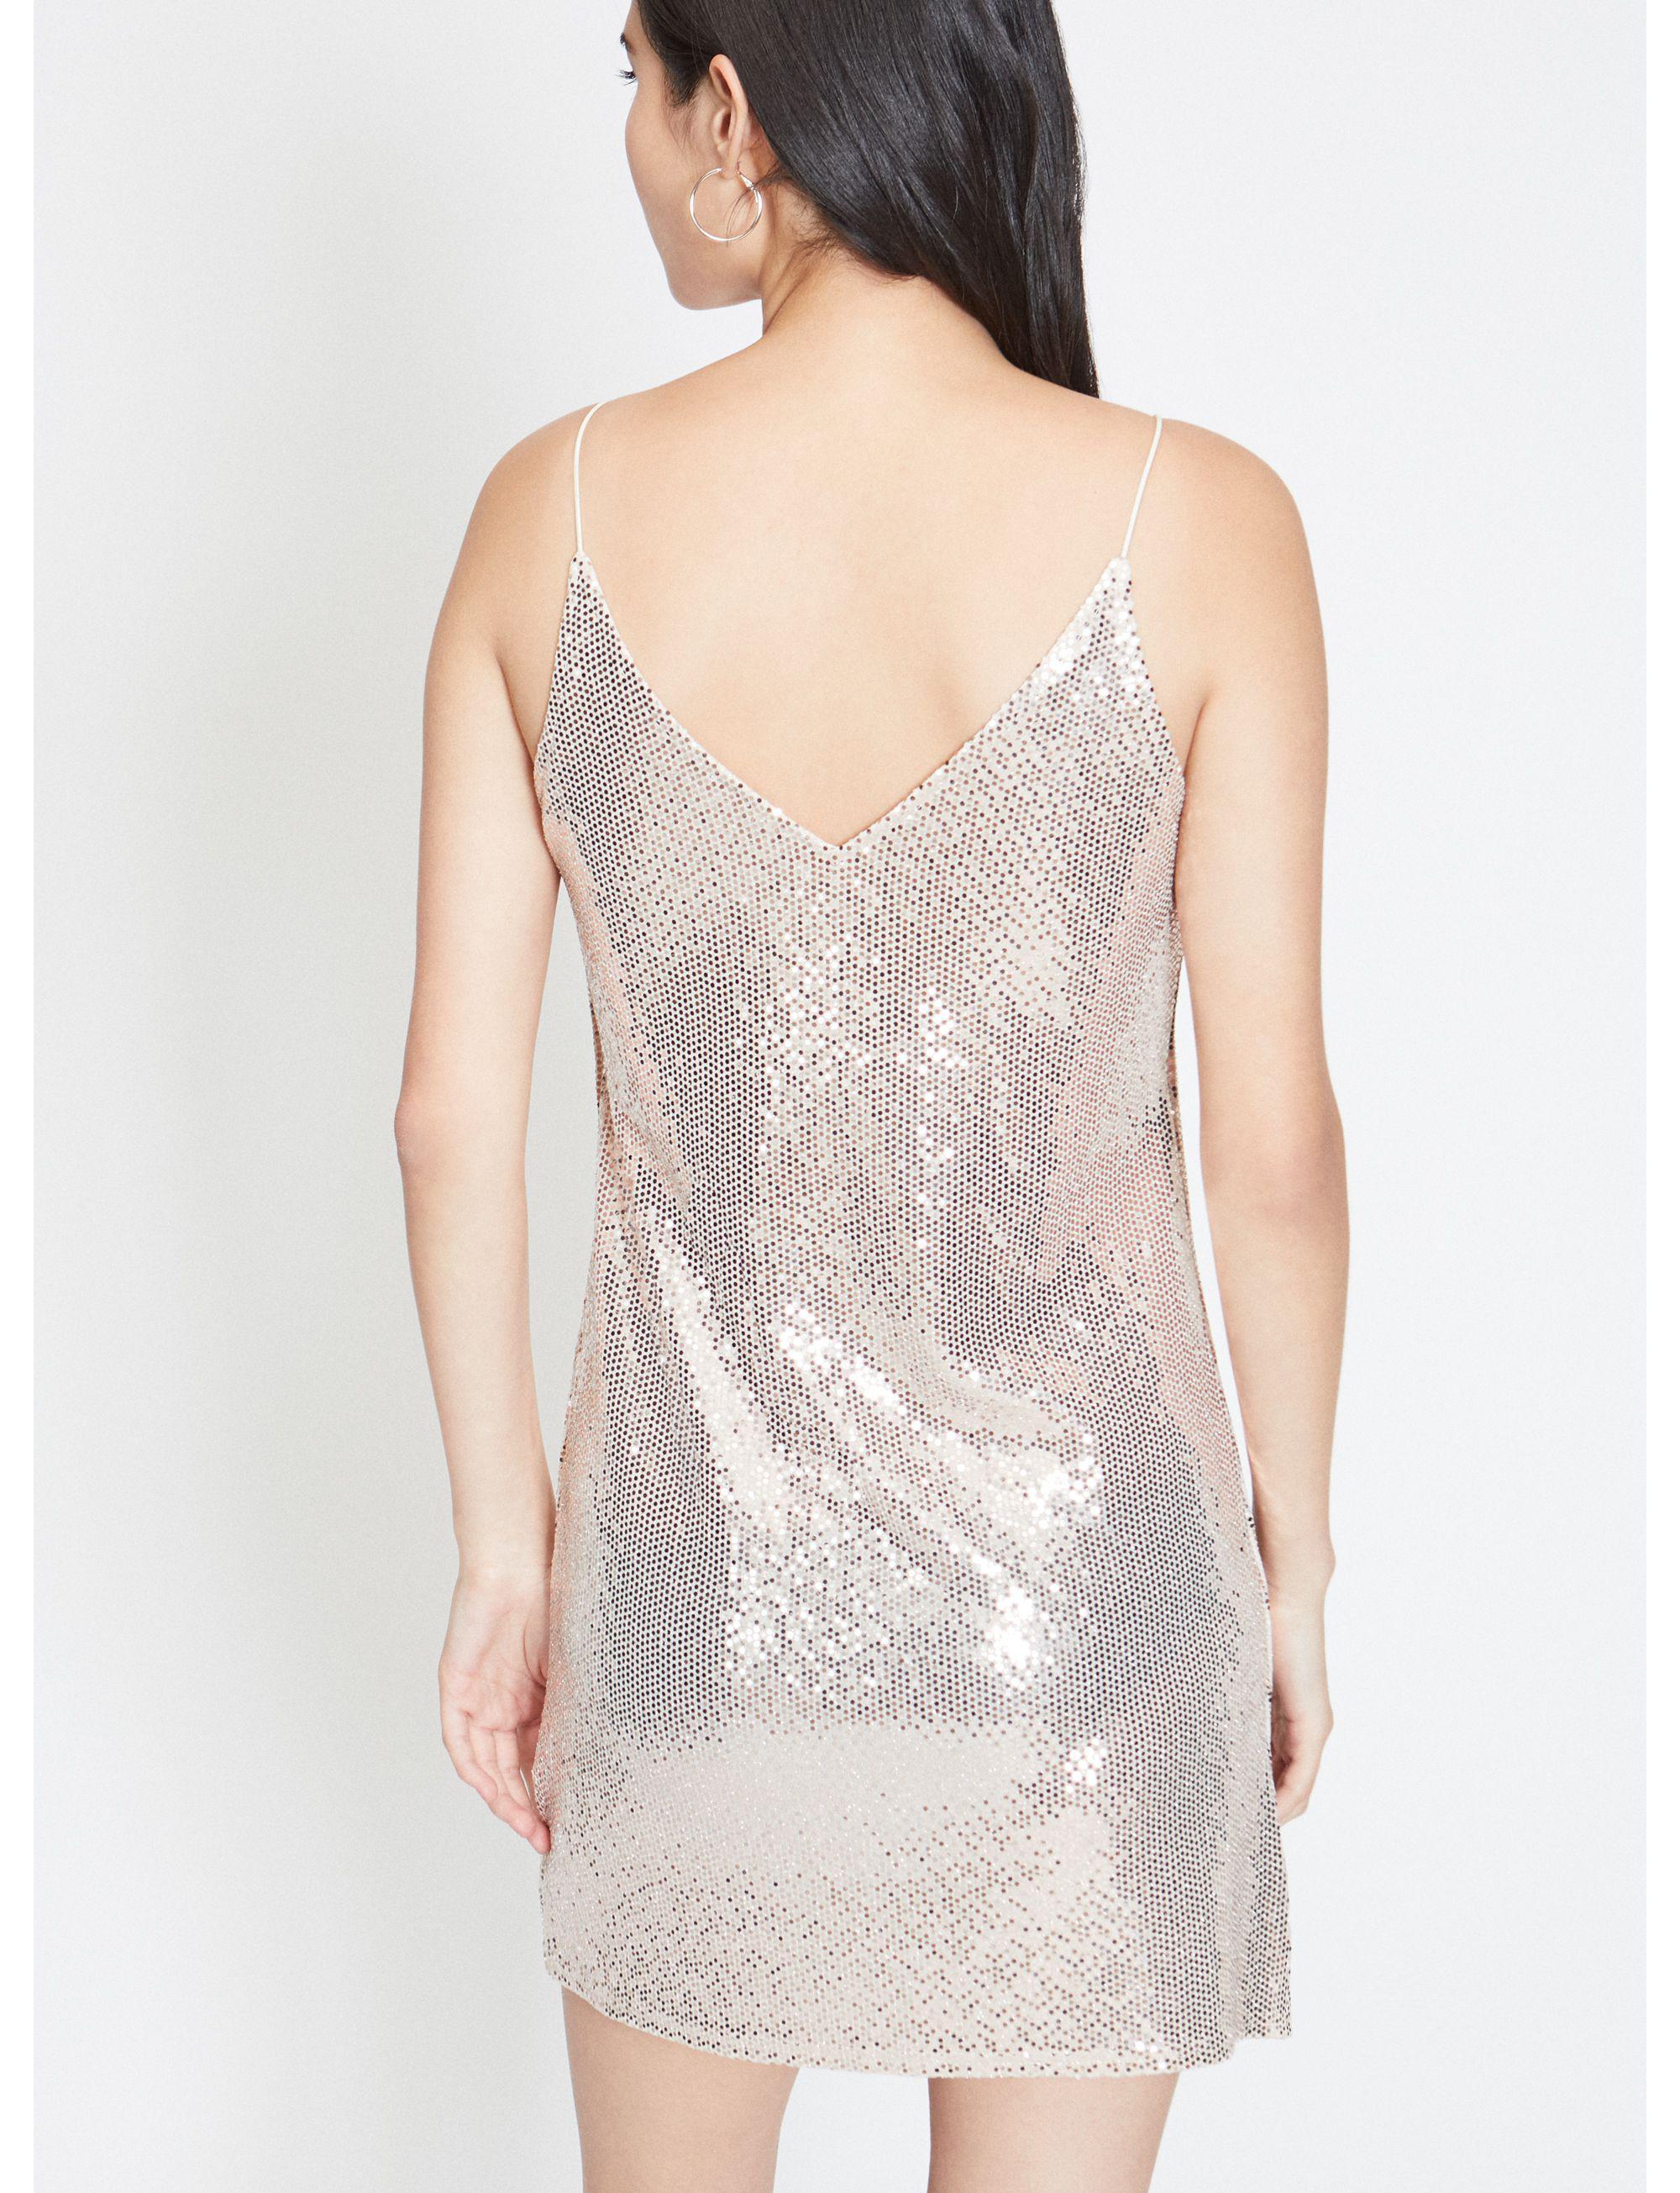 a8b27b6eab Miss Selfridge Champagne Sequin Embellished Mini Slip Dress in Metallic -  Lyst